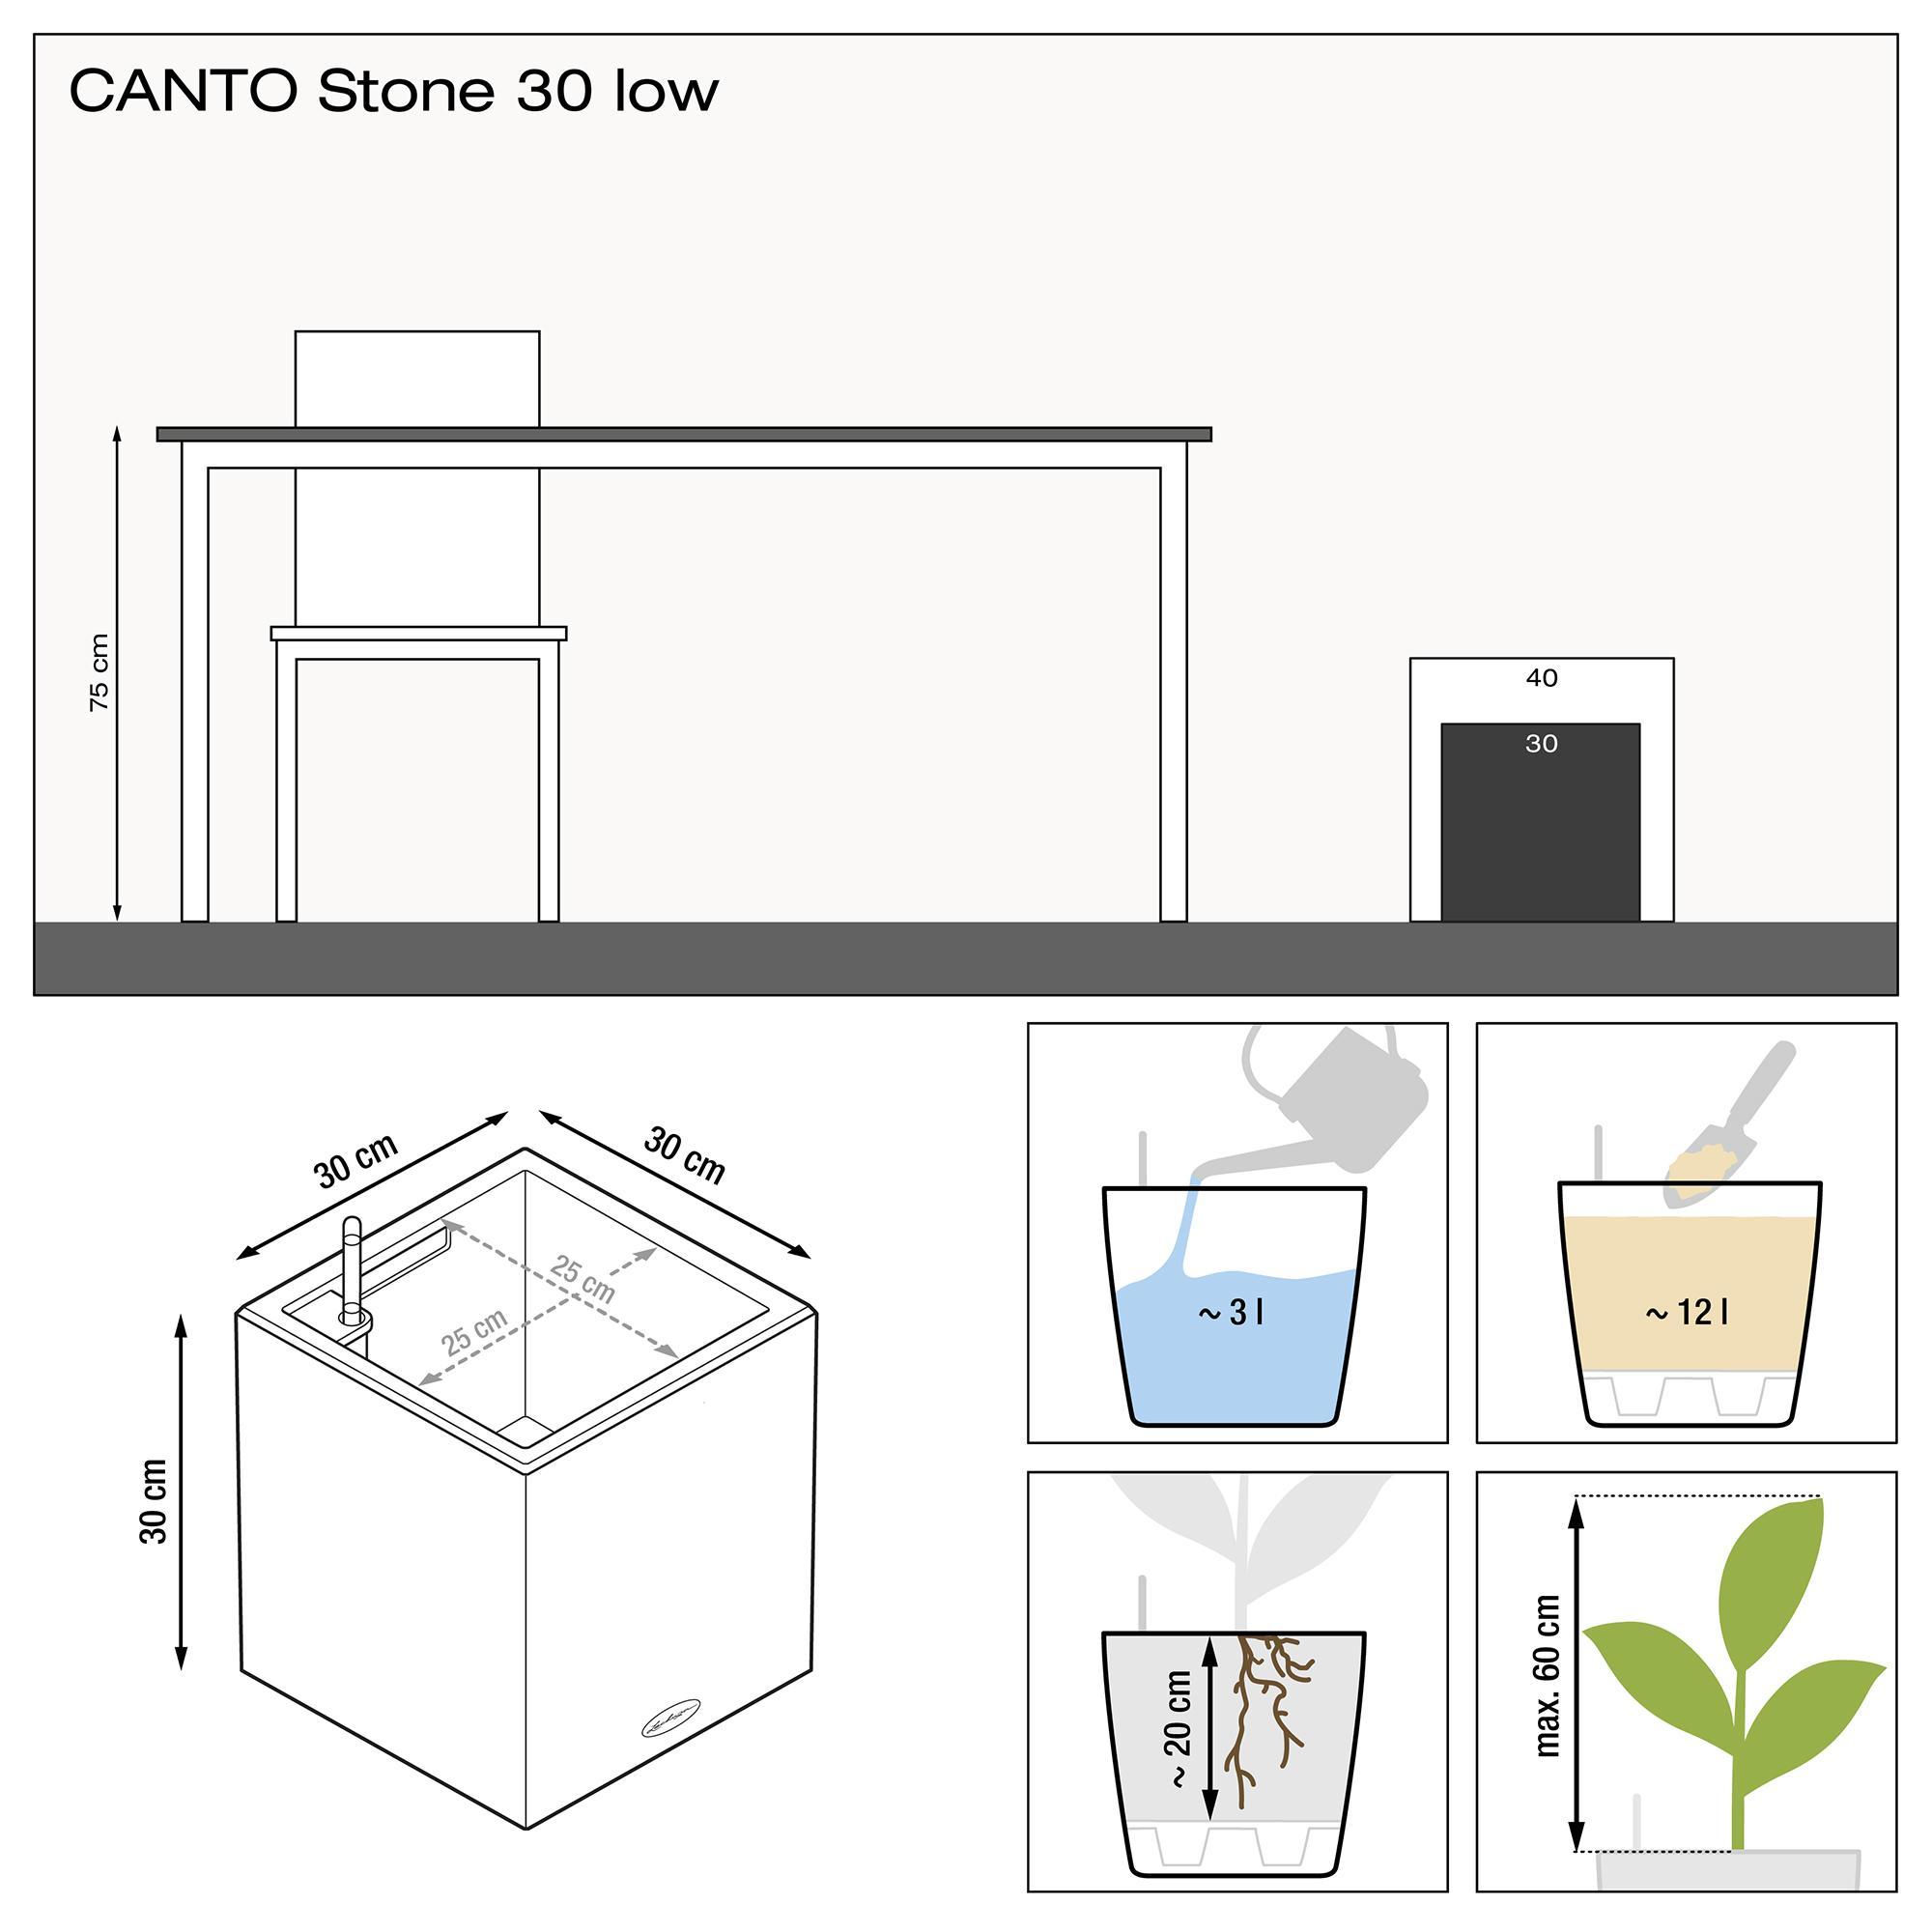 le_canto-stone-wuerfel30_product_addi_nz